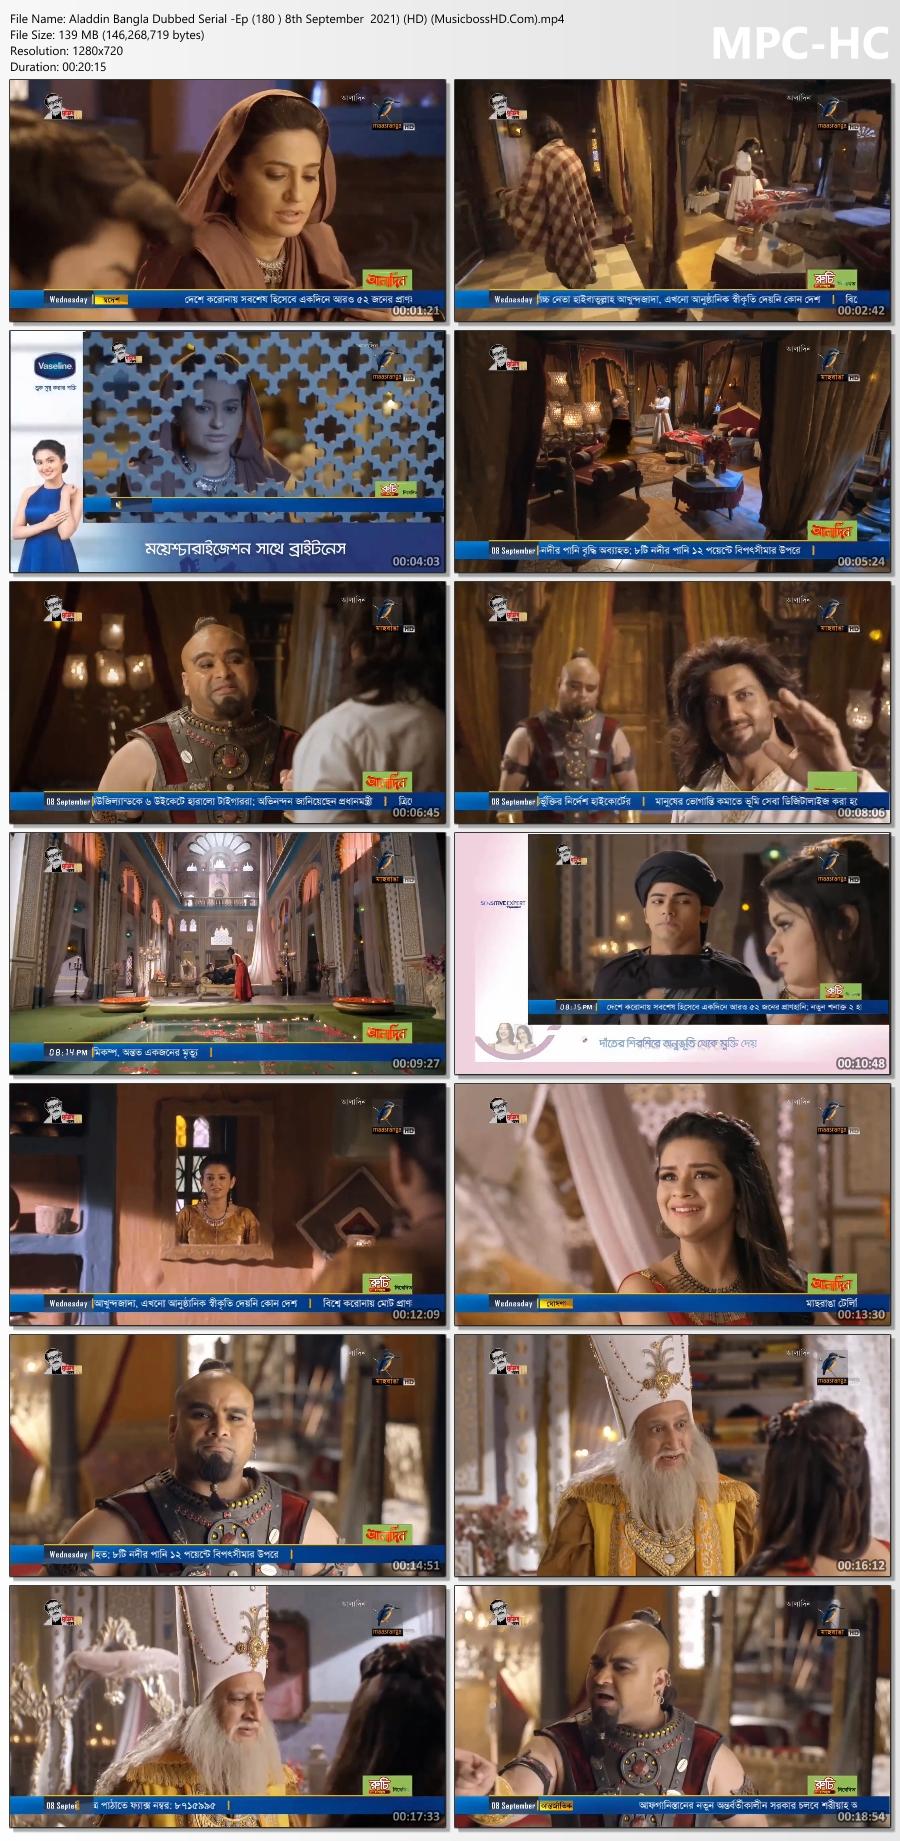 Aladdin-Bangla-Dubbed-Serial-Ep-180-8th-September-2021-HD-Musicboss-HD-Com-mp4-thumbs